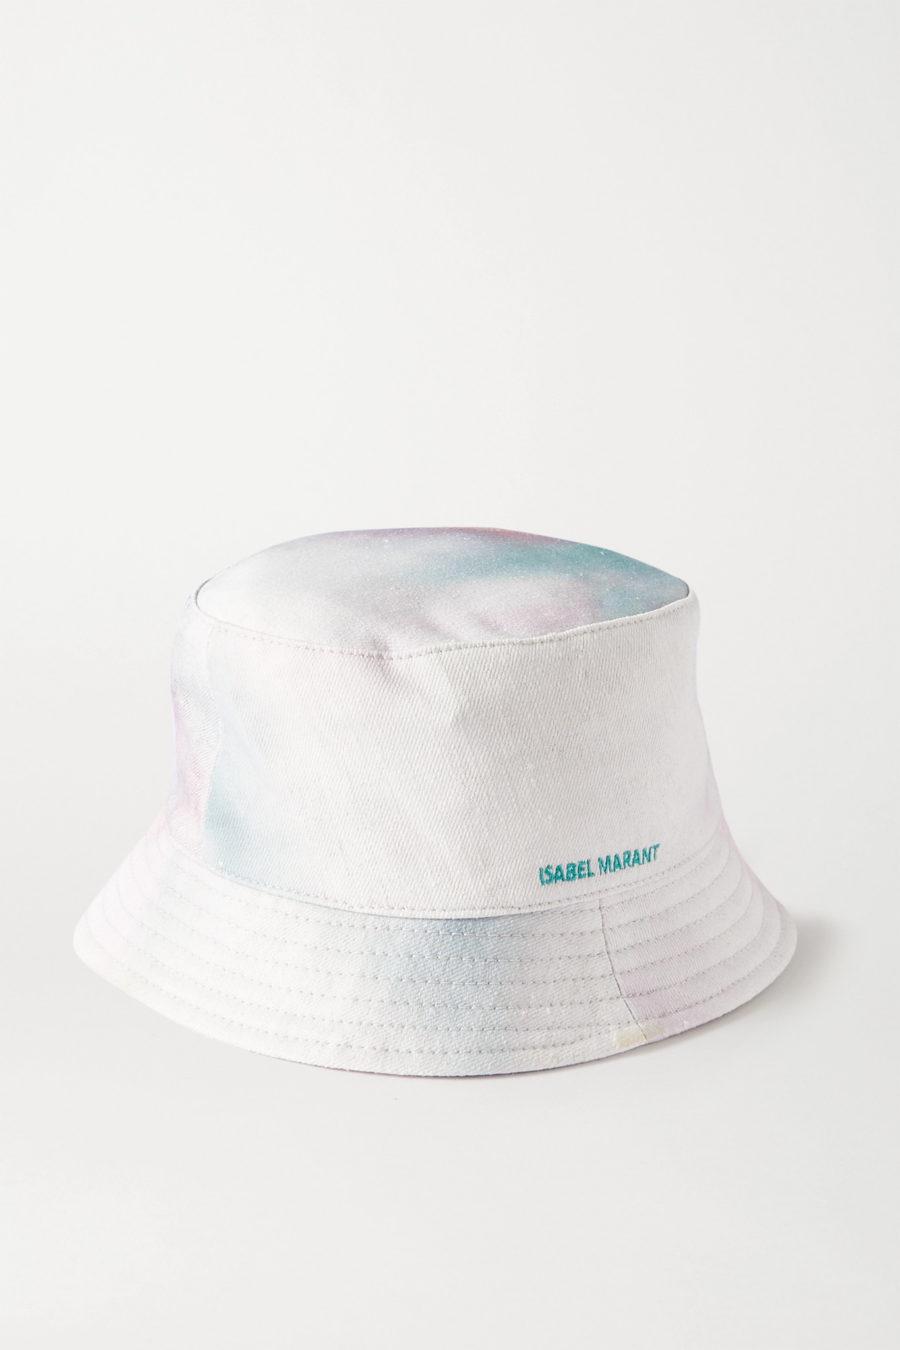 Isabel Marant Haley tie-dyed slub cotton-canvas bucket hat ($160)